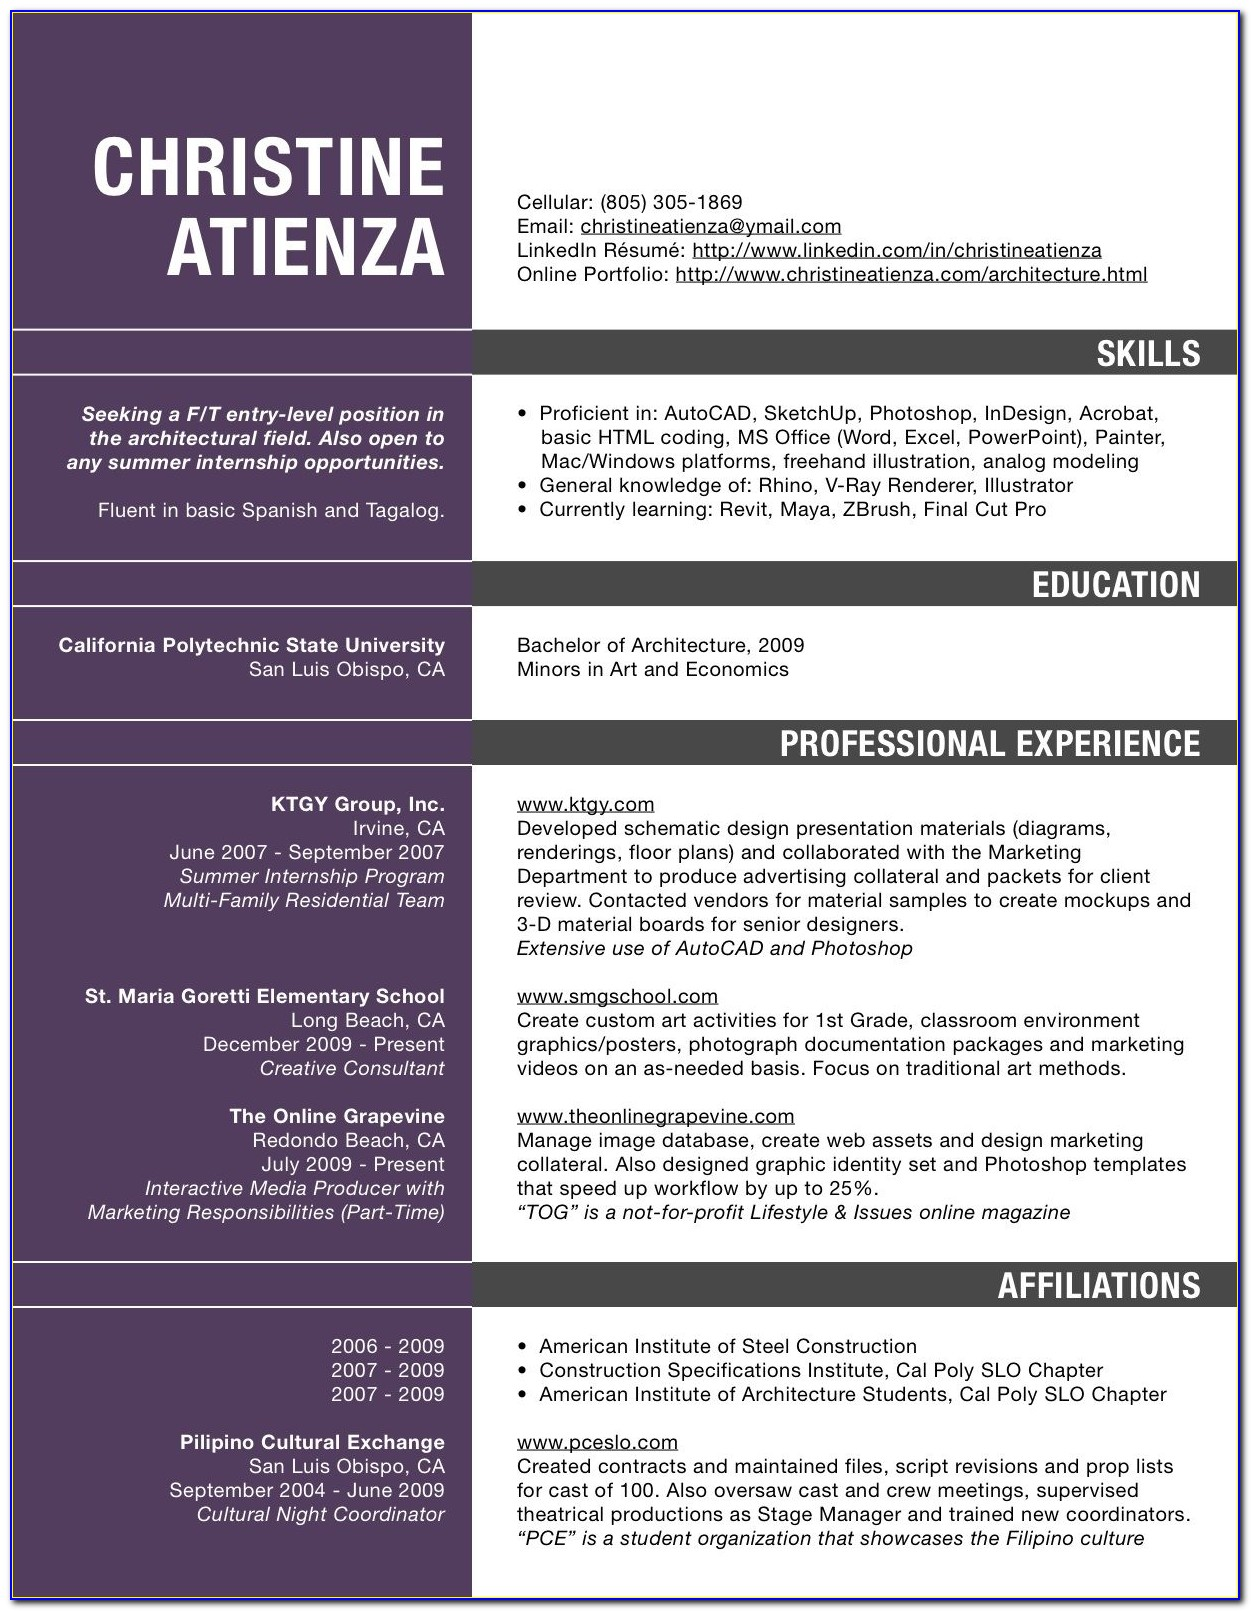 Copy Paste Resume Format